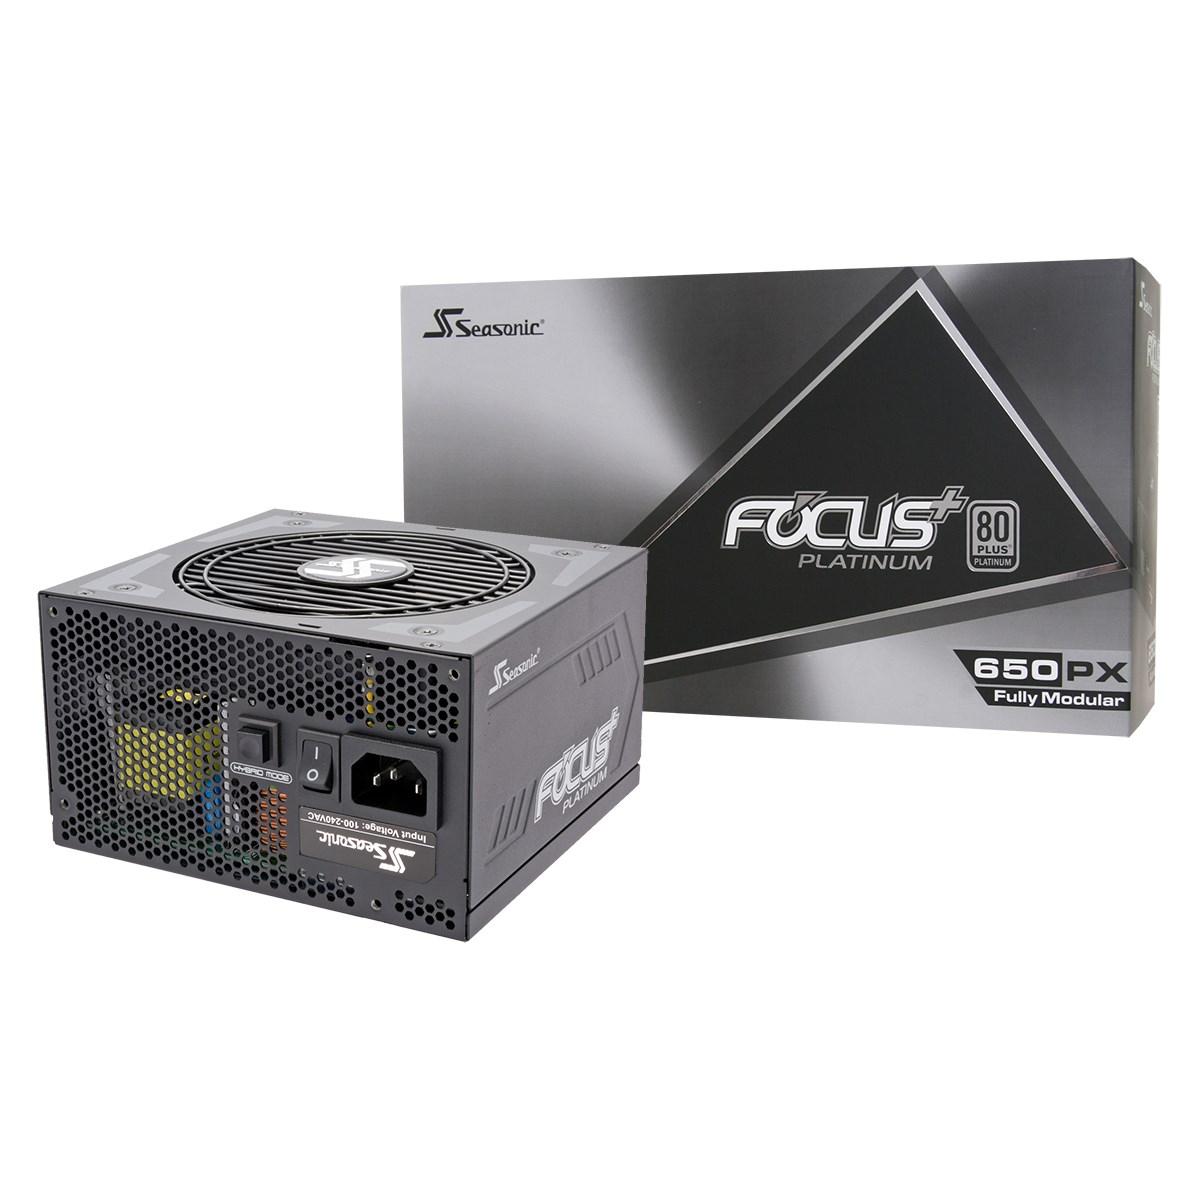 Seasonic Focus Plus+ 650 Watt Platinum Modular PSU/Power Supply, £85.47 at Scan